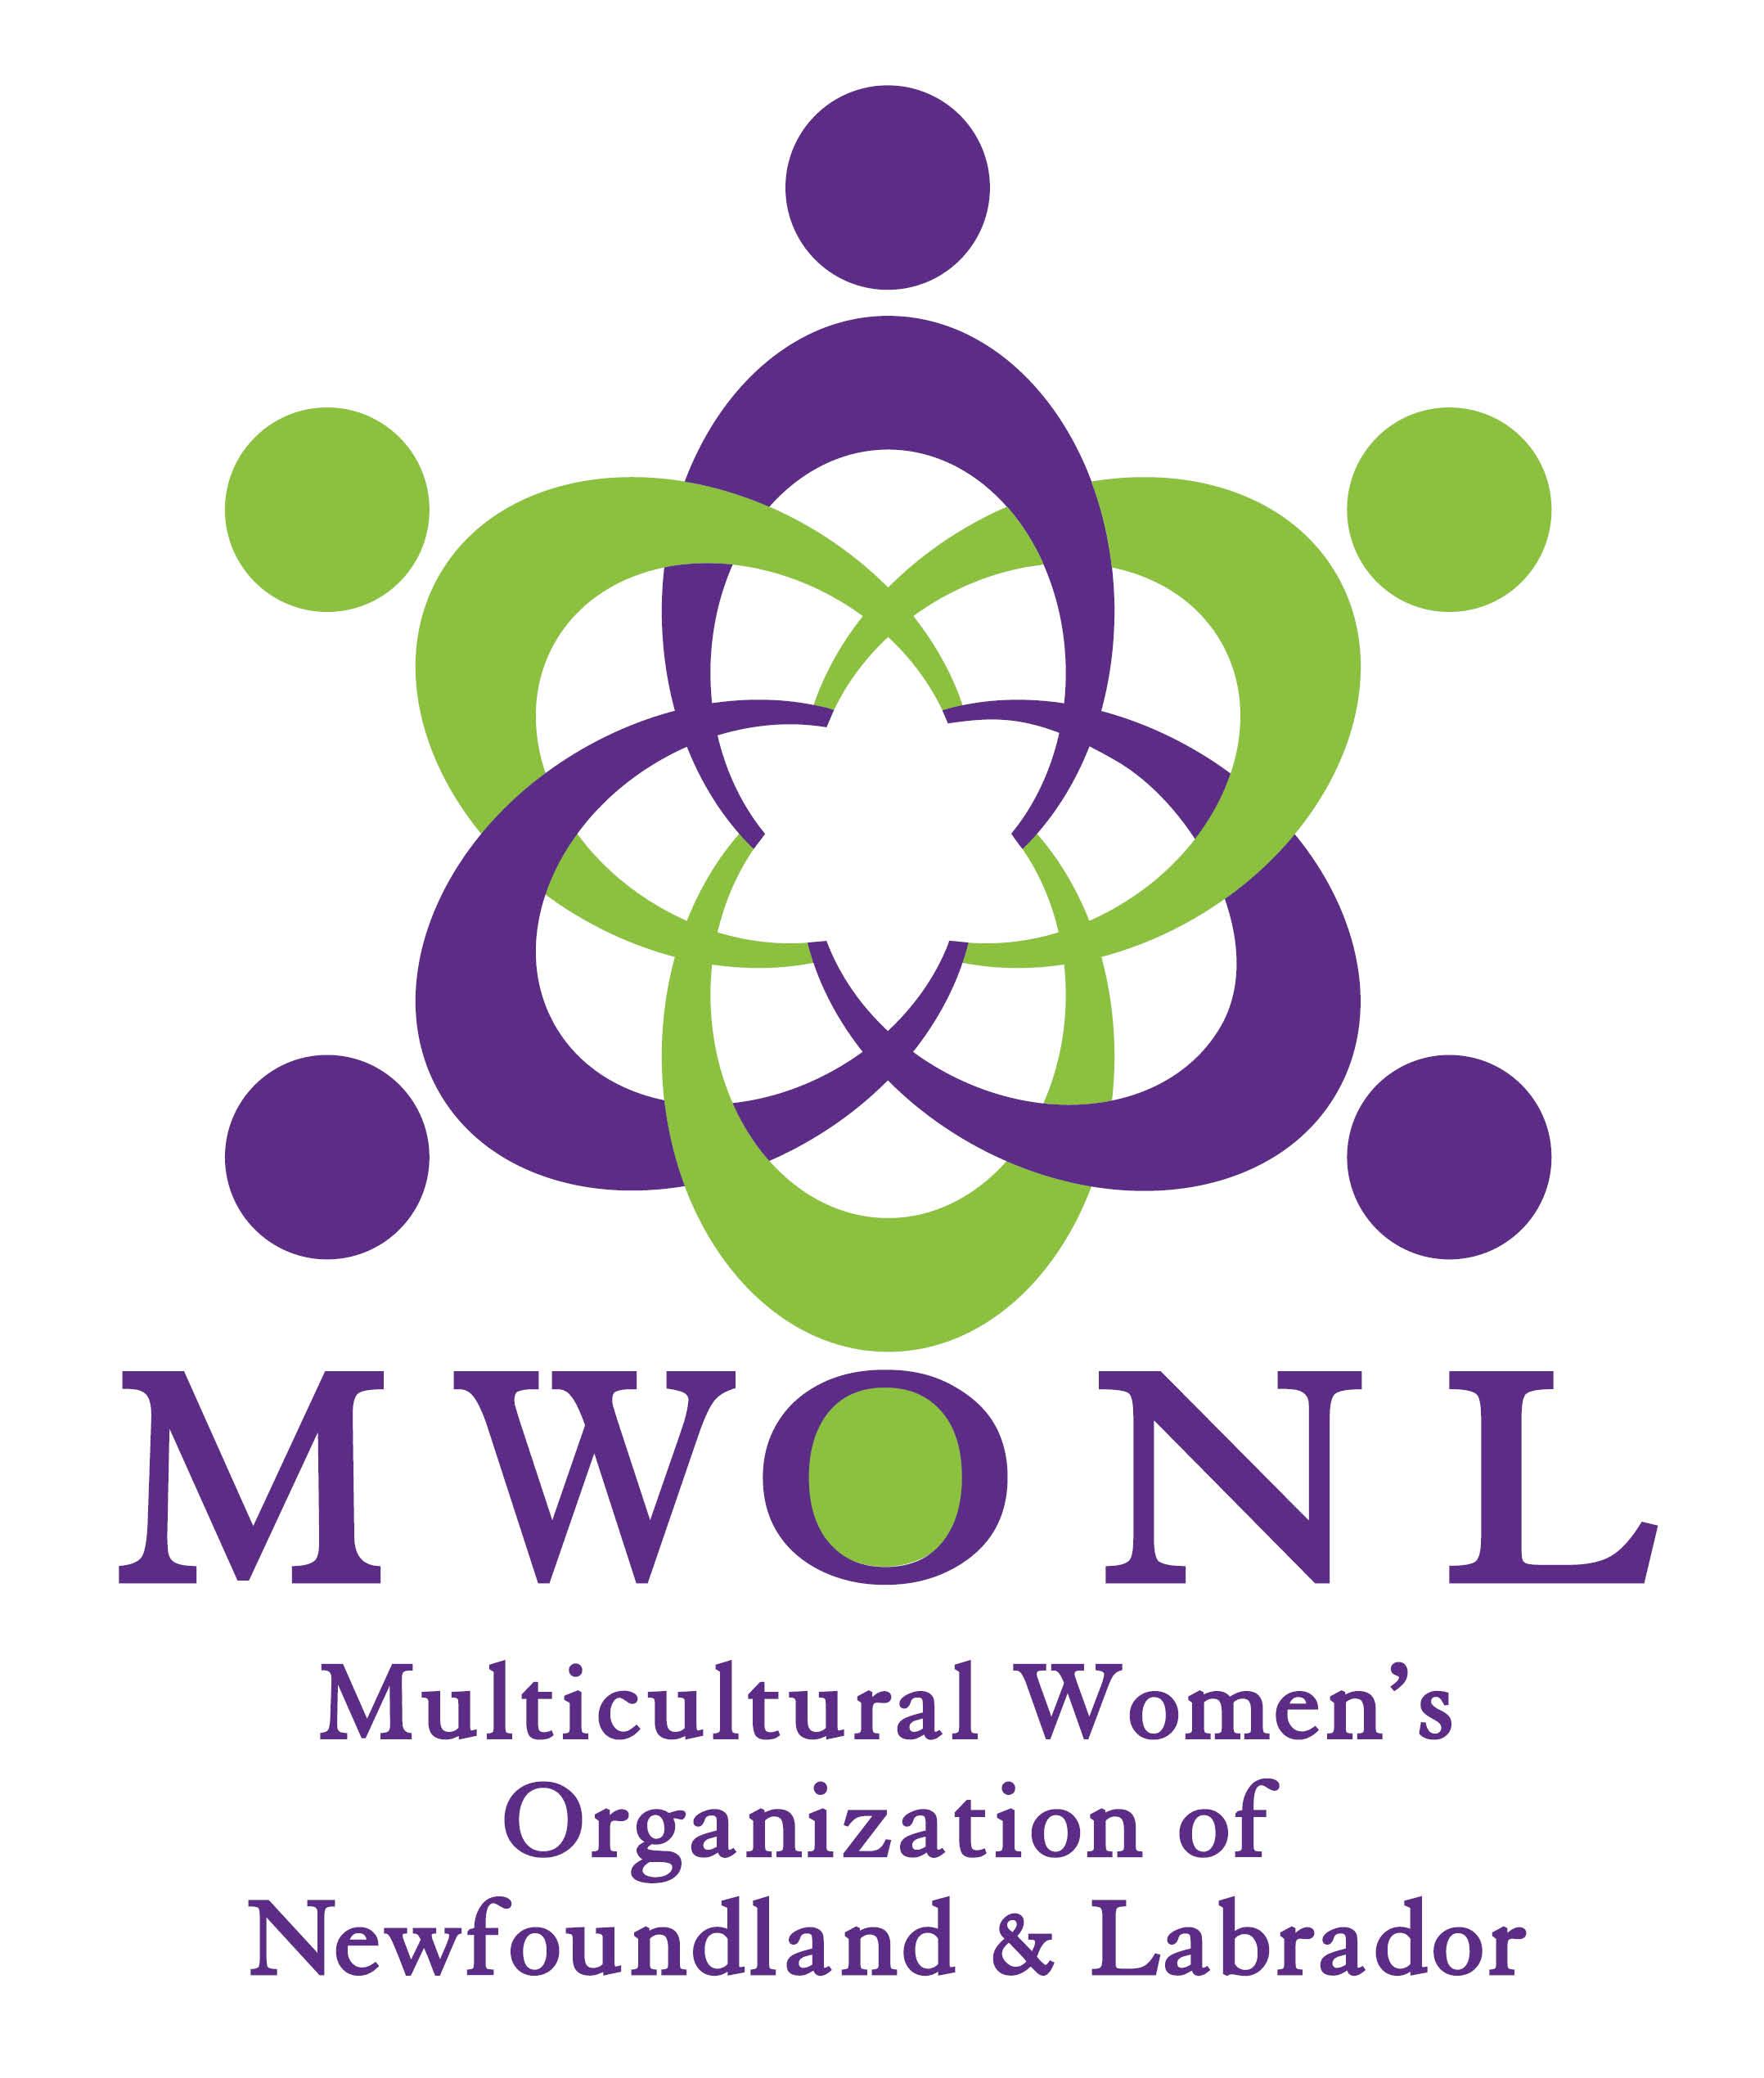 Multicultural Women's Organization of NL Logo